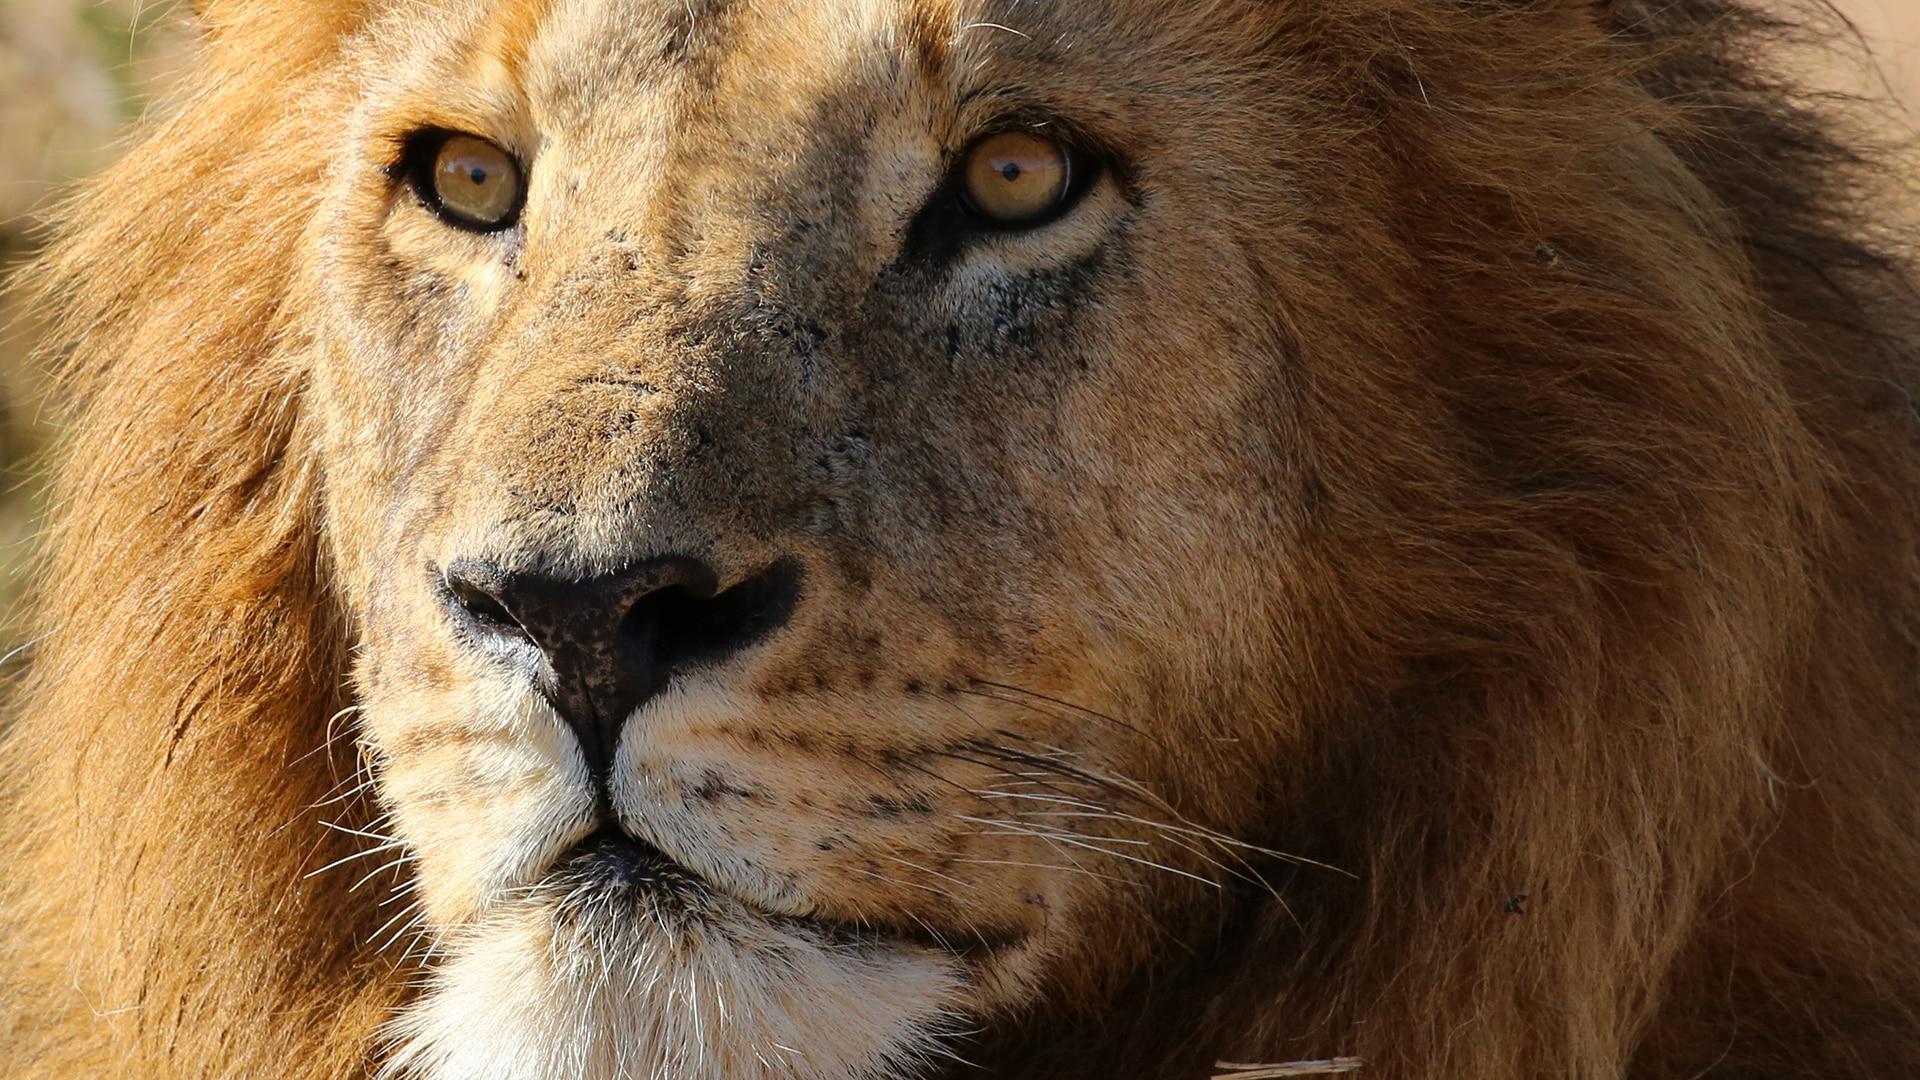 Adult male lion fiercely stares ahead in Mara Naboisho Conservancy, Kenya